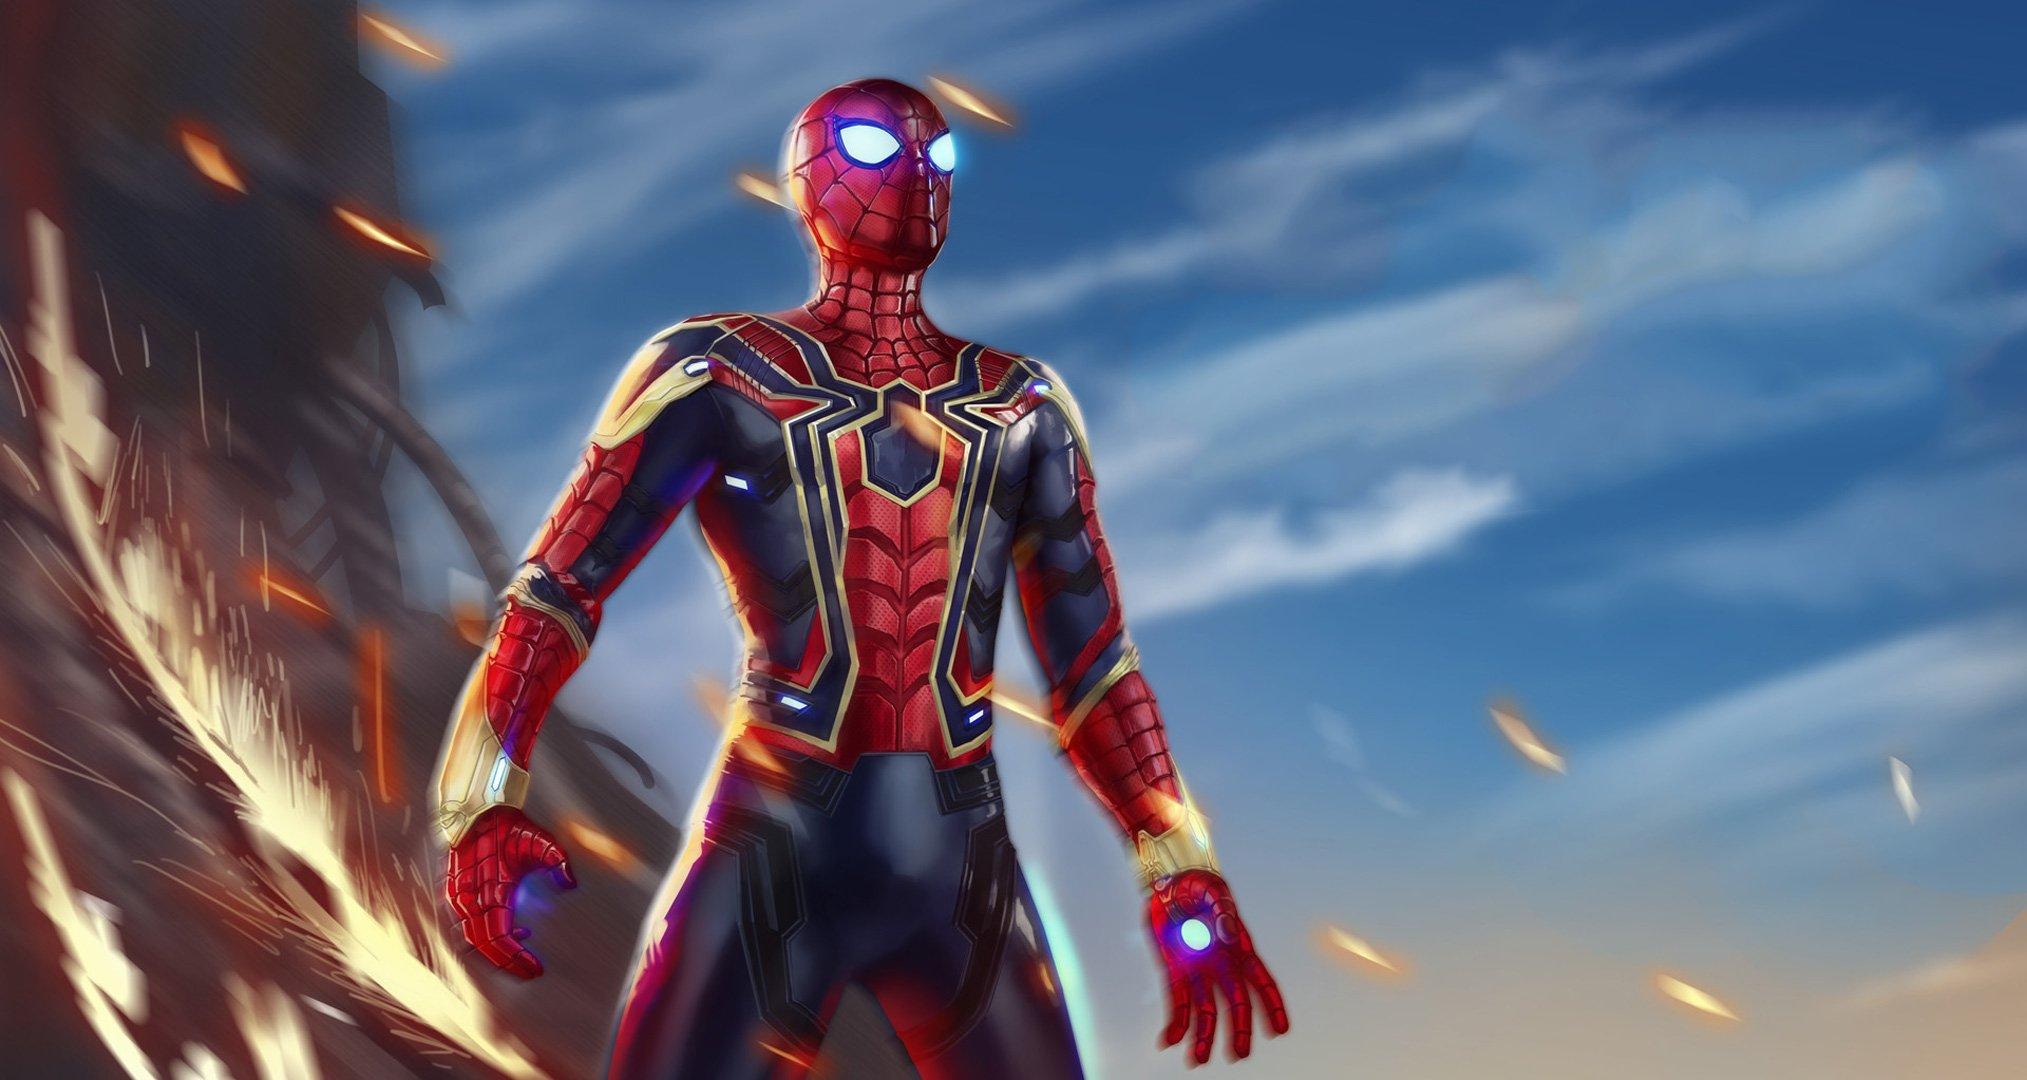 Wallpaper Iron Spiderman Avengers Infinity War